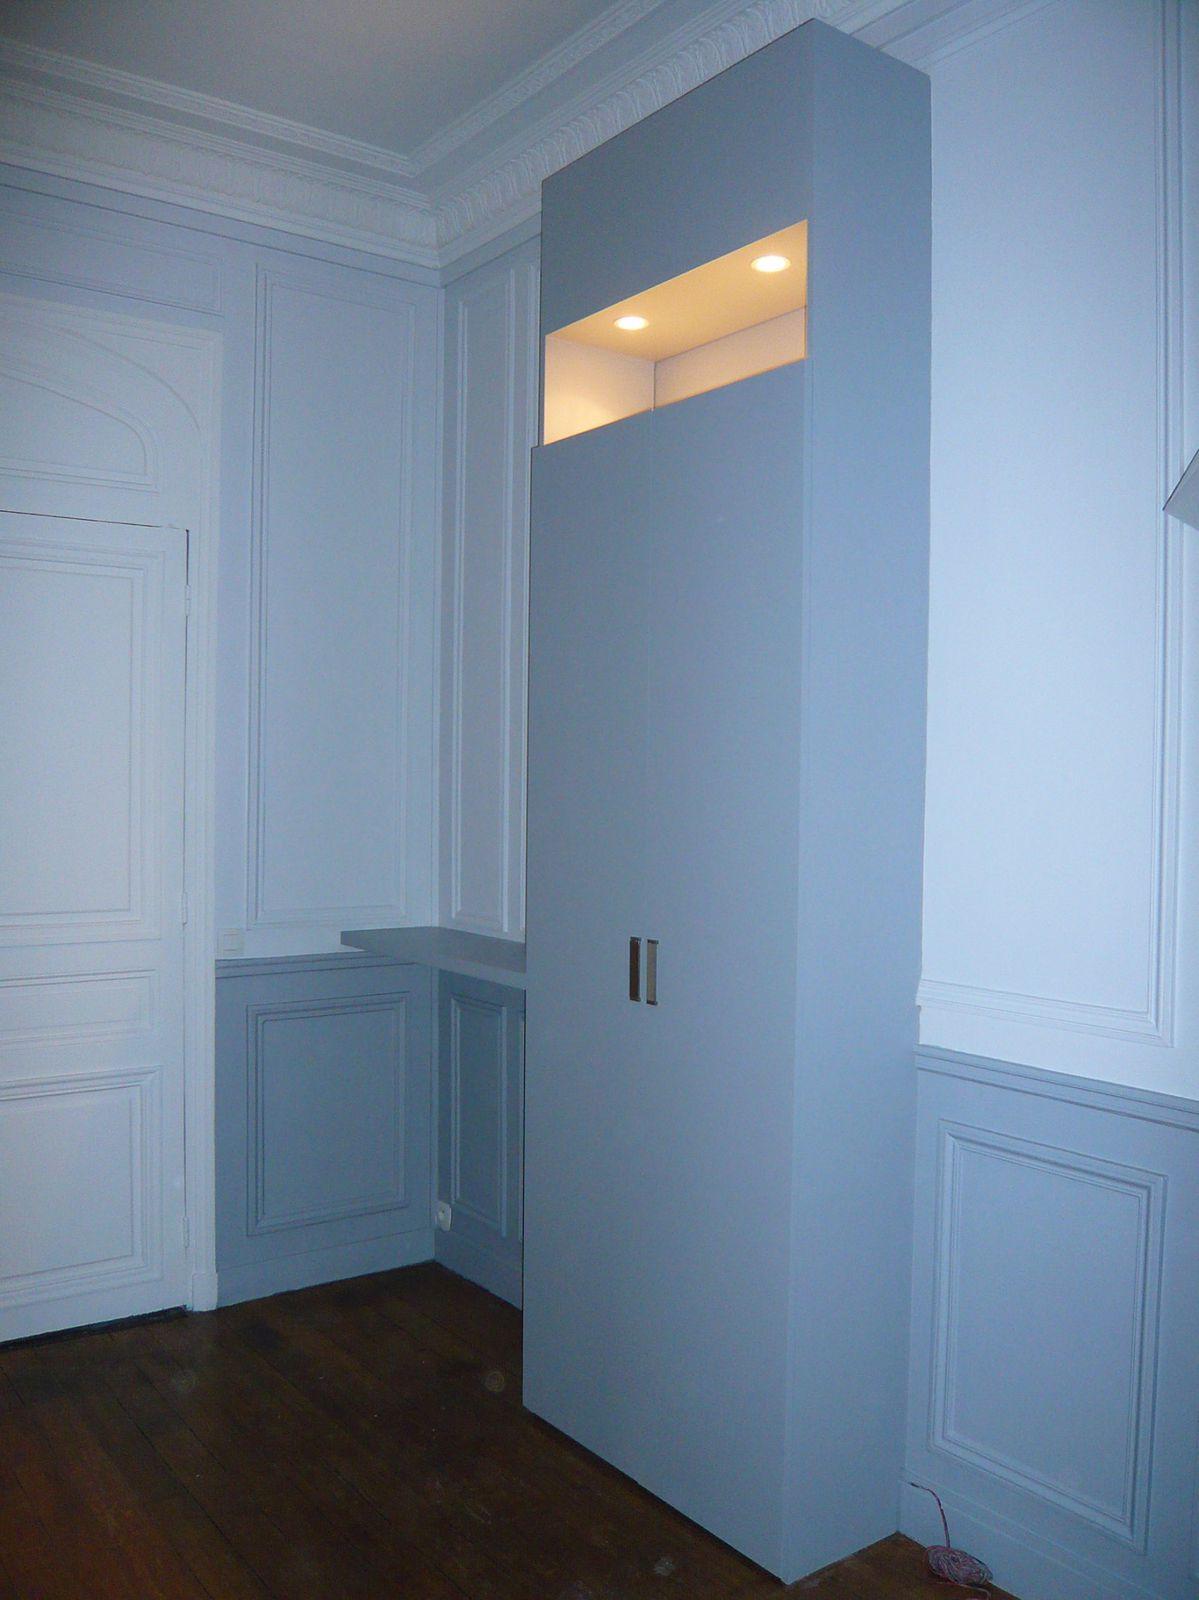 dressing entree couloir simple meuble dentre songmics vestiaire mtallique portan with dressing. Black Bedroom Furniture Sets. Home Design Ideas